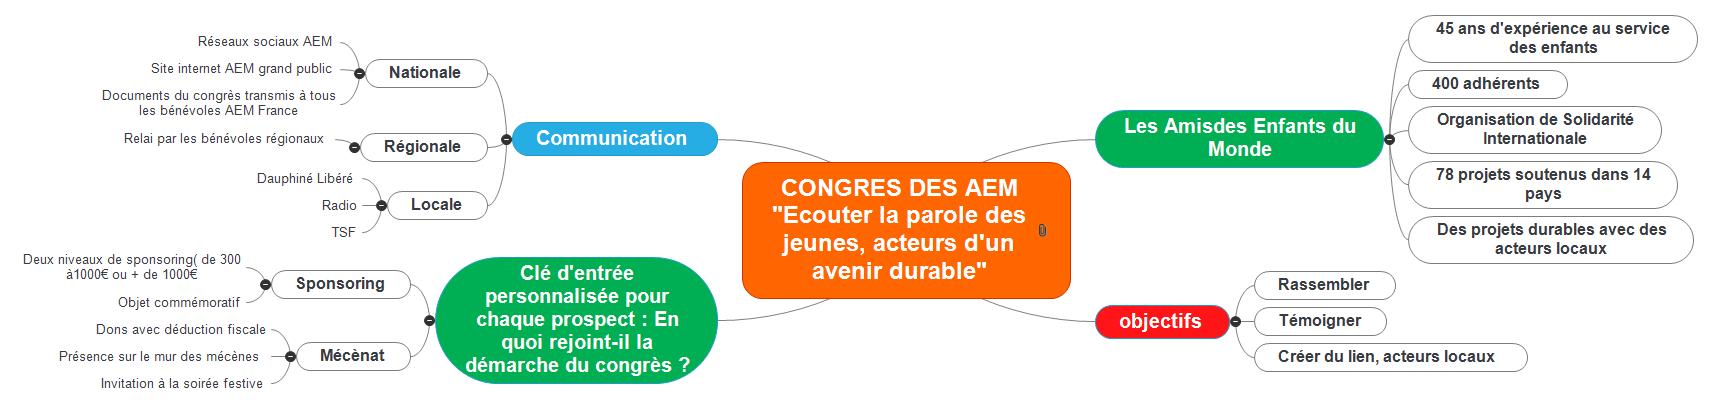 CONGRES DES AEM 2022 Mind Maps